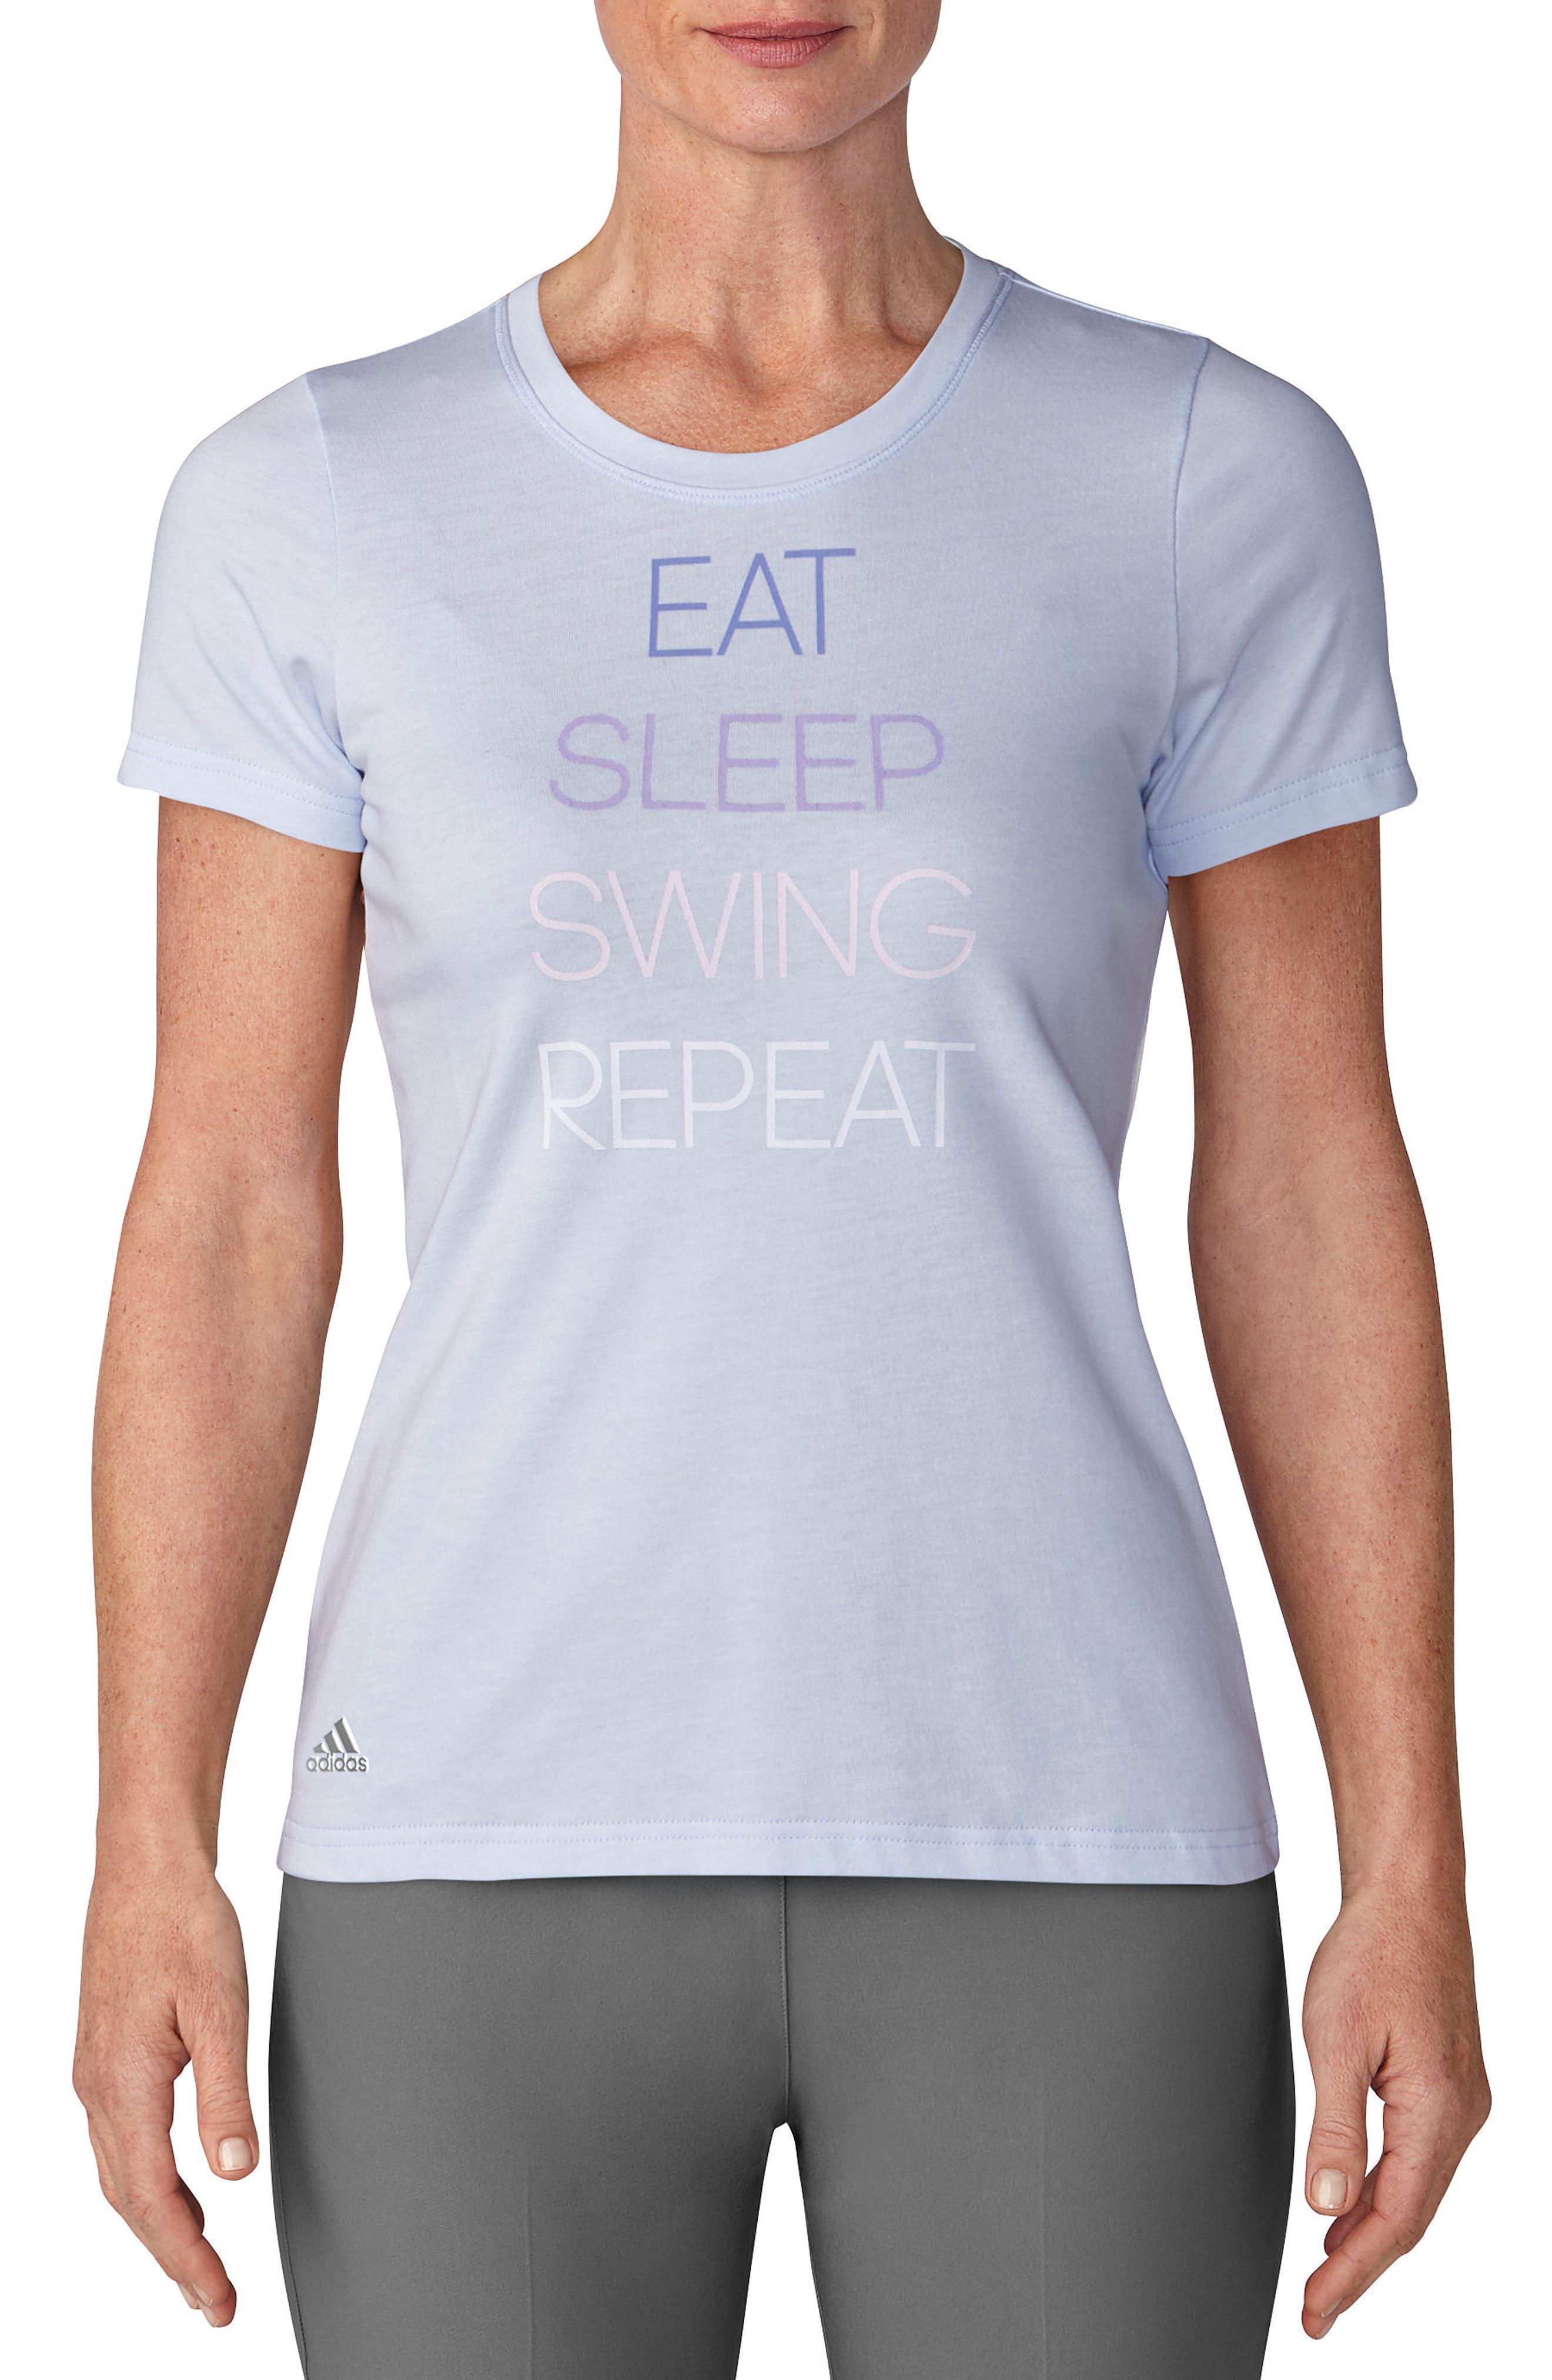 Eat, Swing, Sleep, Repeat Graphic Tee,                             Main thumbnail 1, color,                             Aero Blue